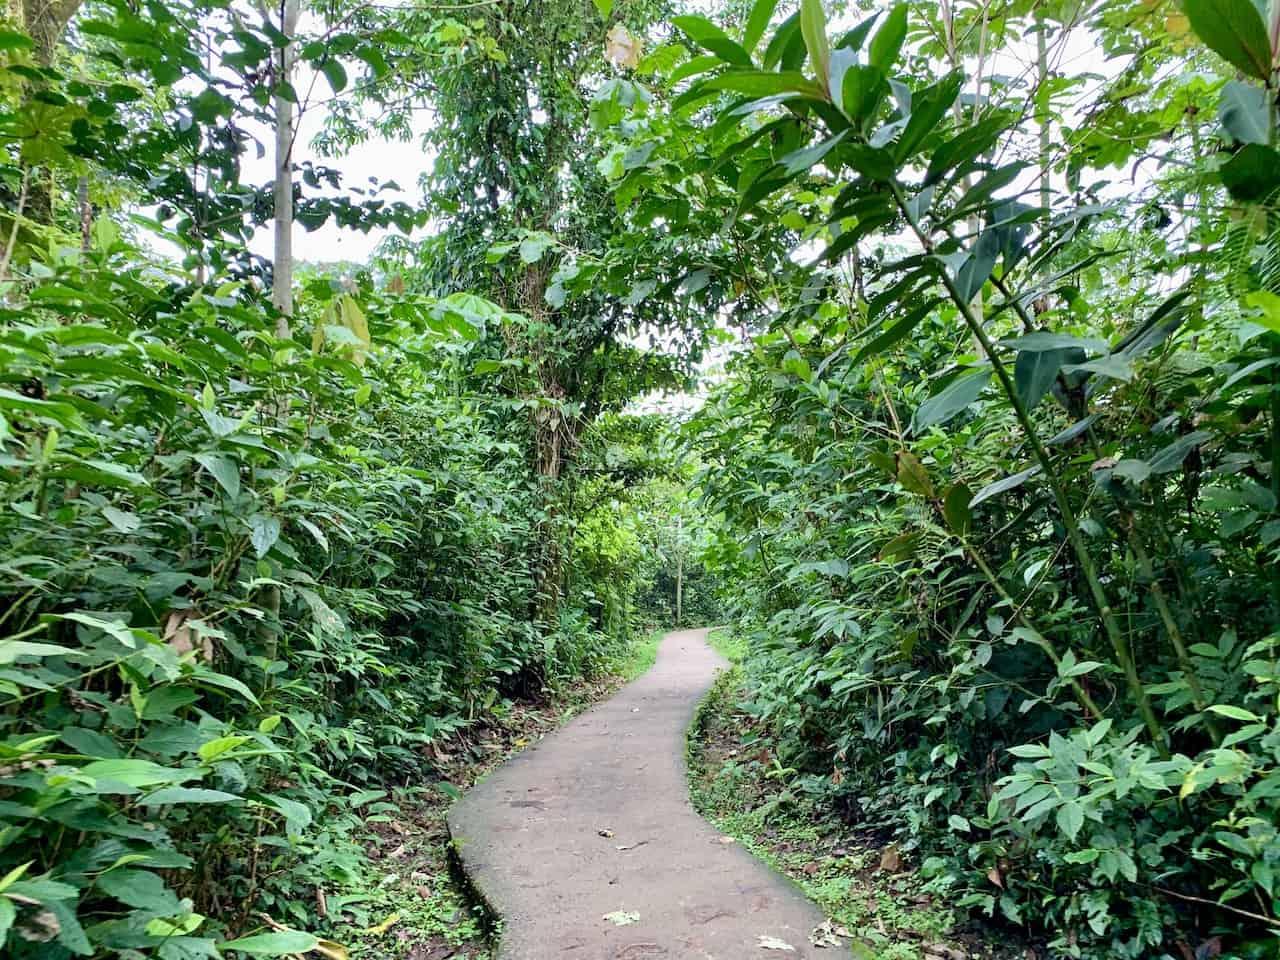 Rio Celeste Pathway